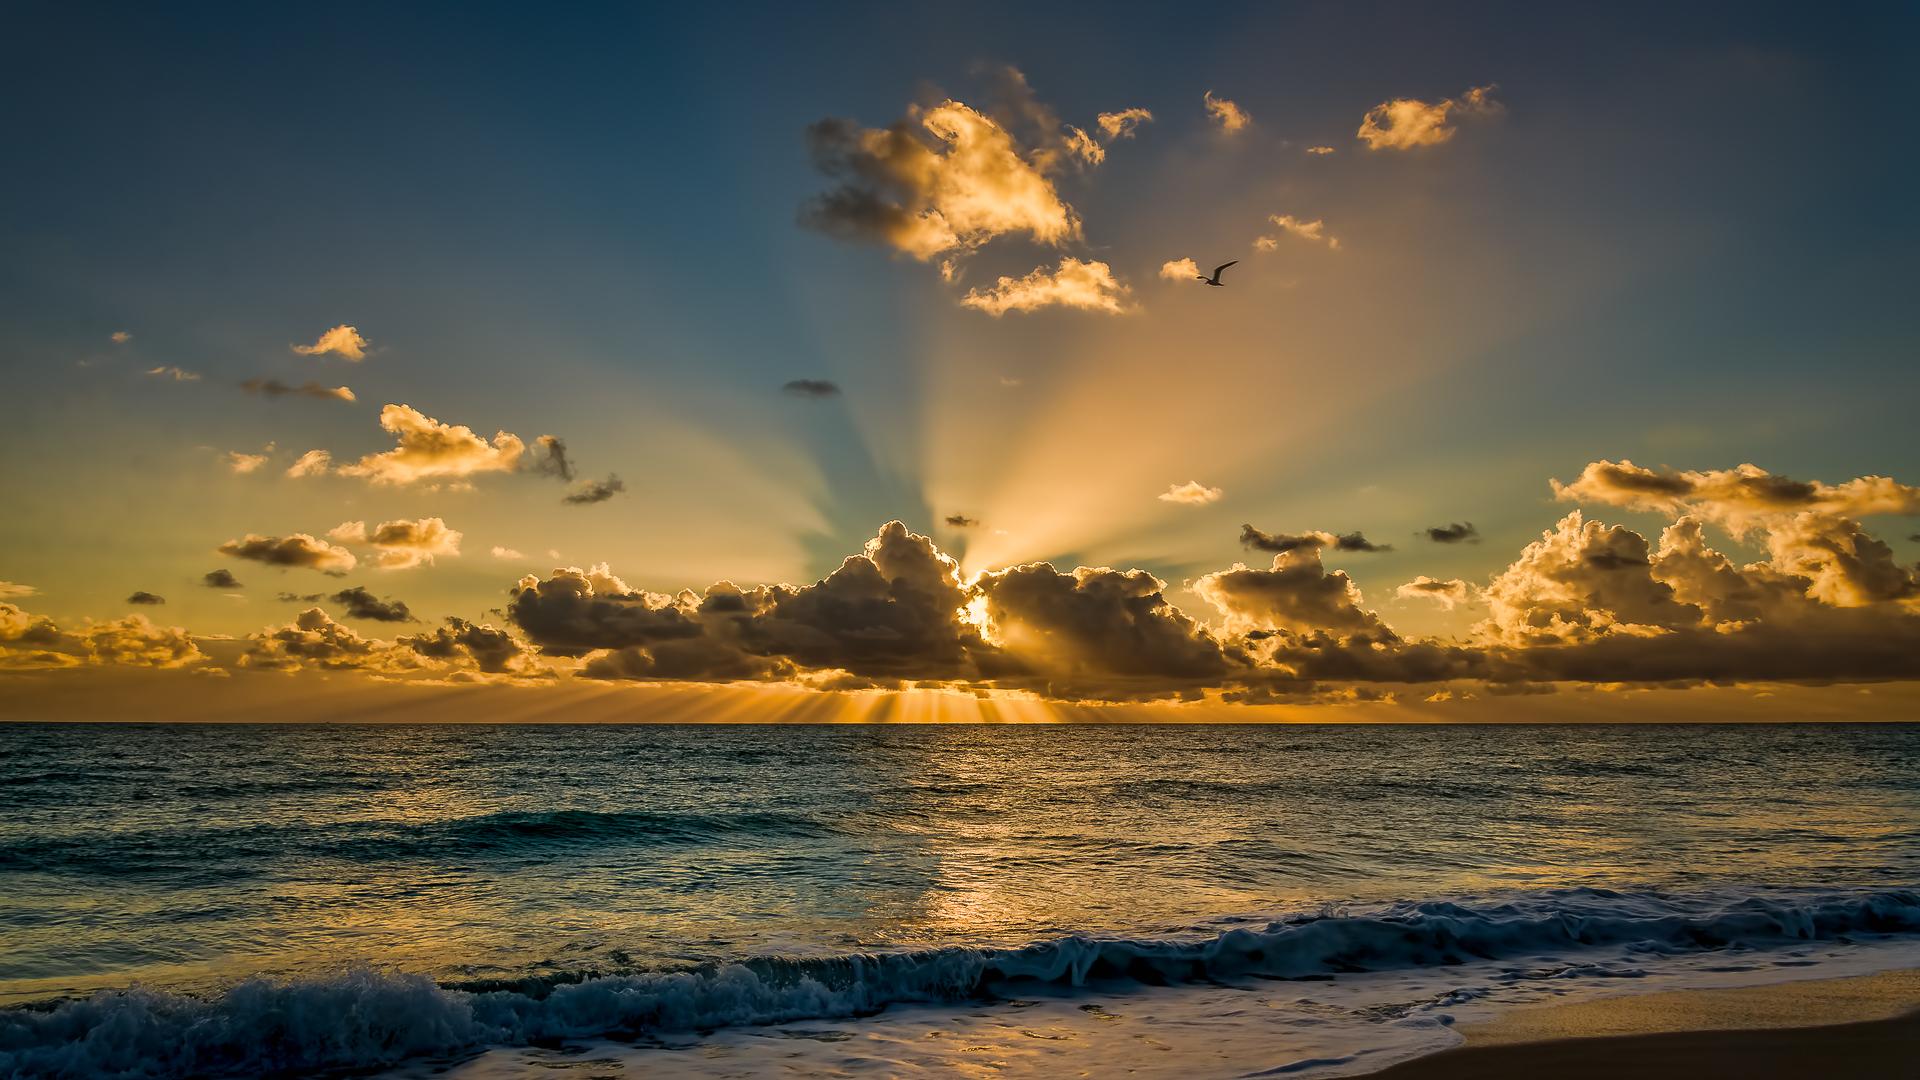 Sun Beach And Sea Wallpaper: Sun Shining Behind The Clouds HD Wallpaper